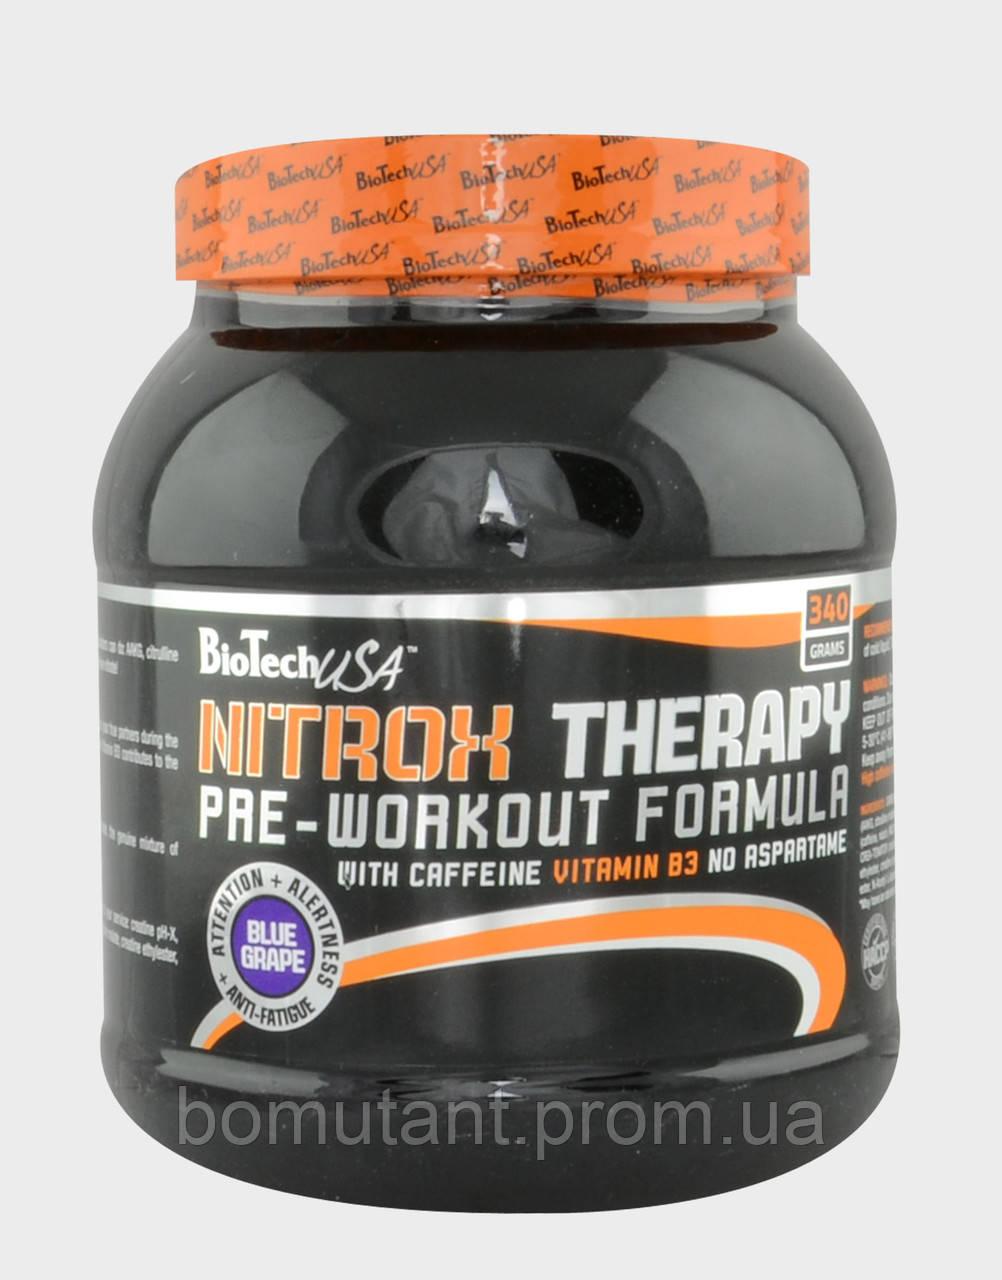 Nitrox Therapy 340 гр blue grape BioTech